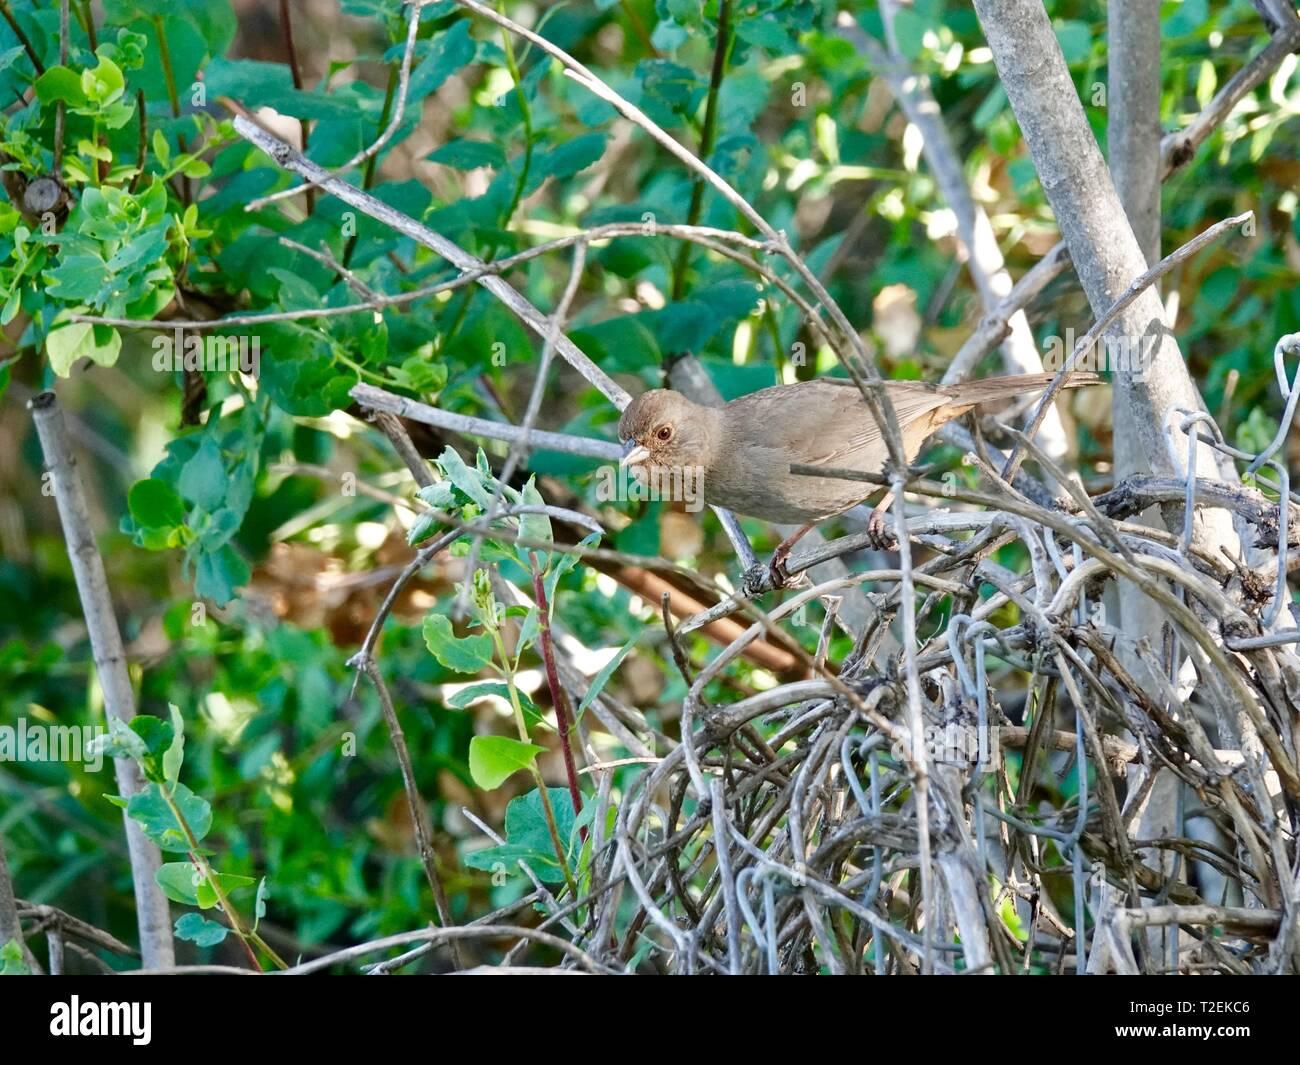 california-towhee-melozone-crissalis-per